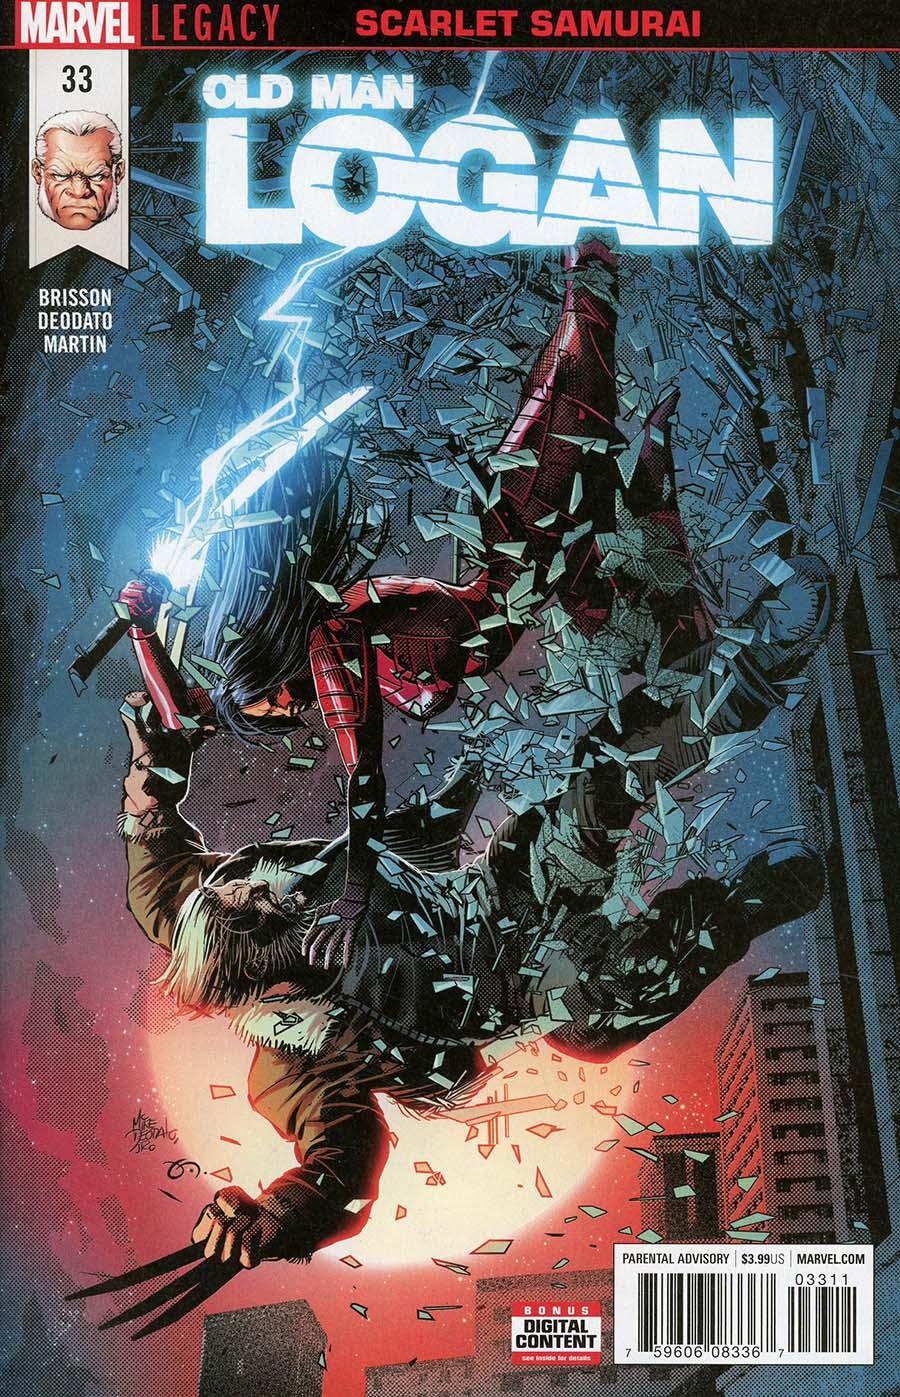 Old Man Logan Vol 2 #33 (Marvel Legacy Tie-In)